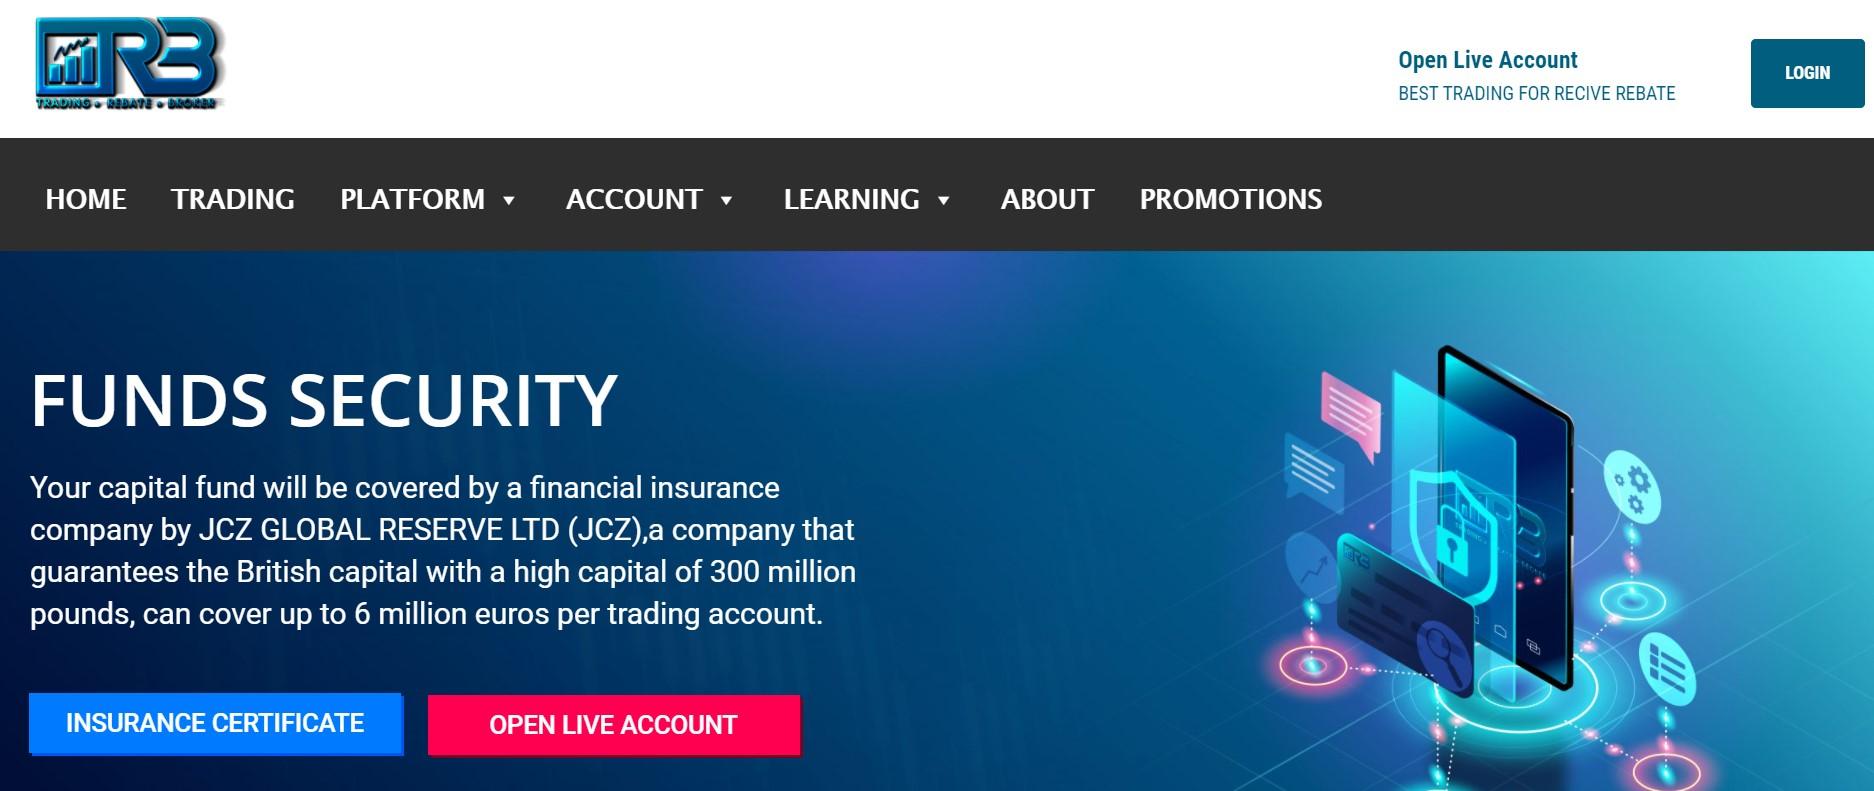 TRB website